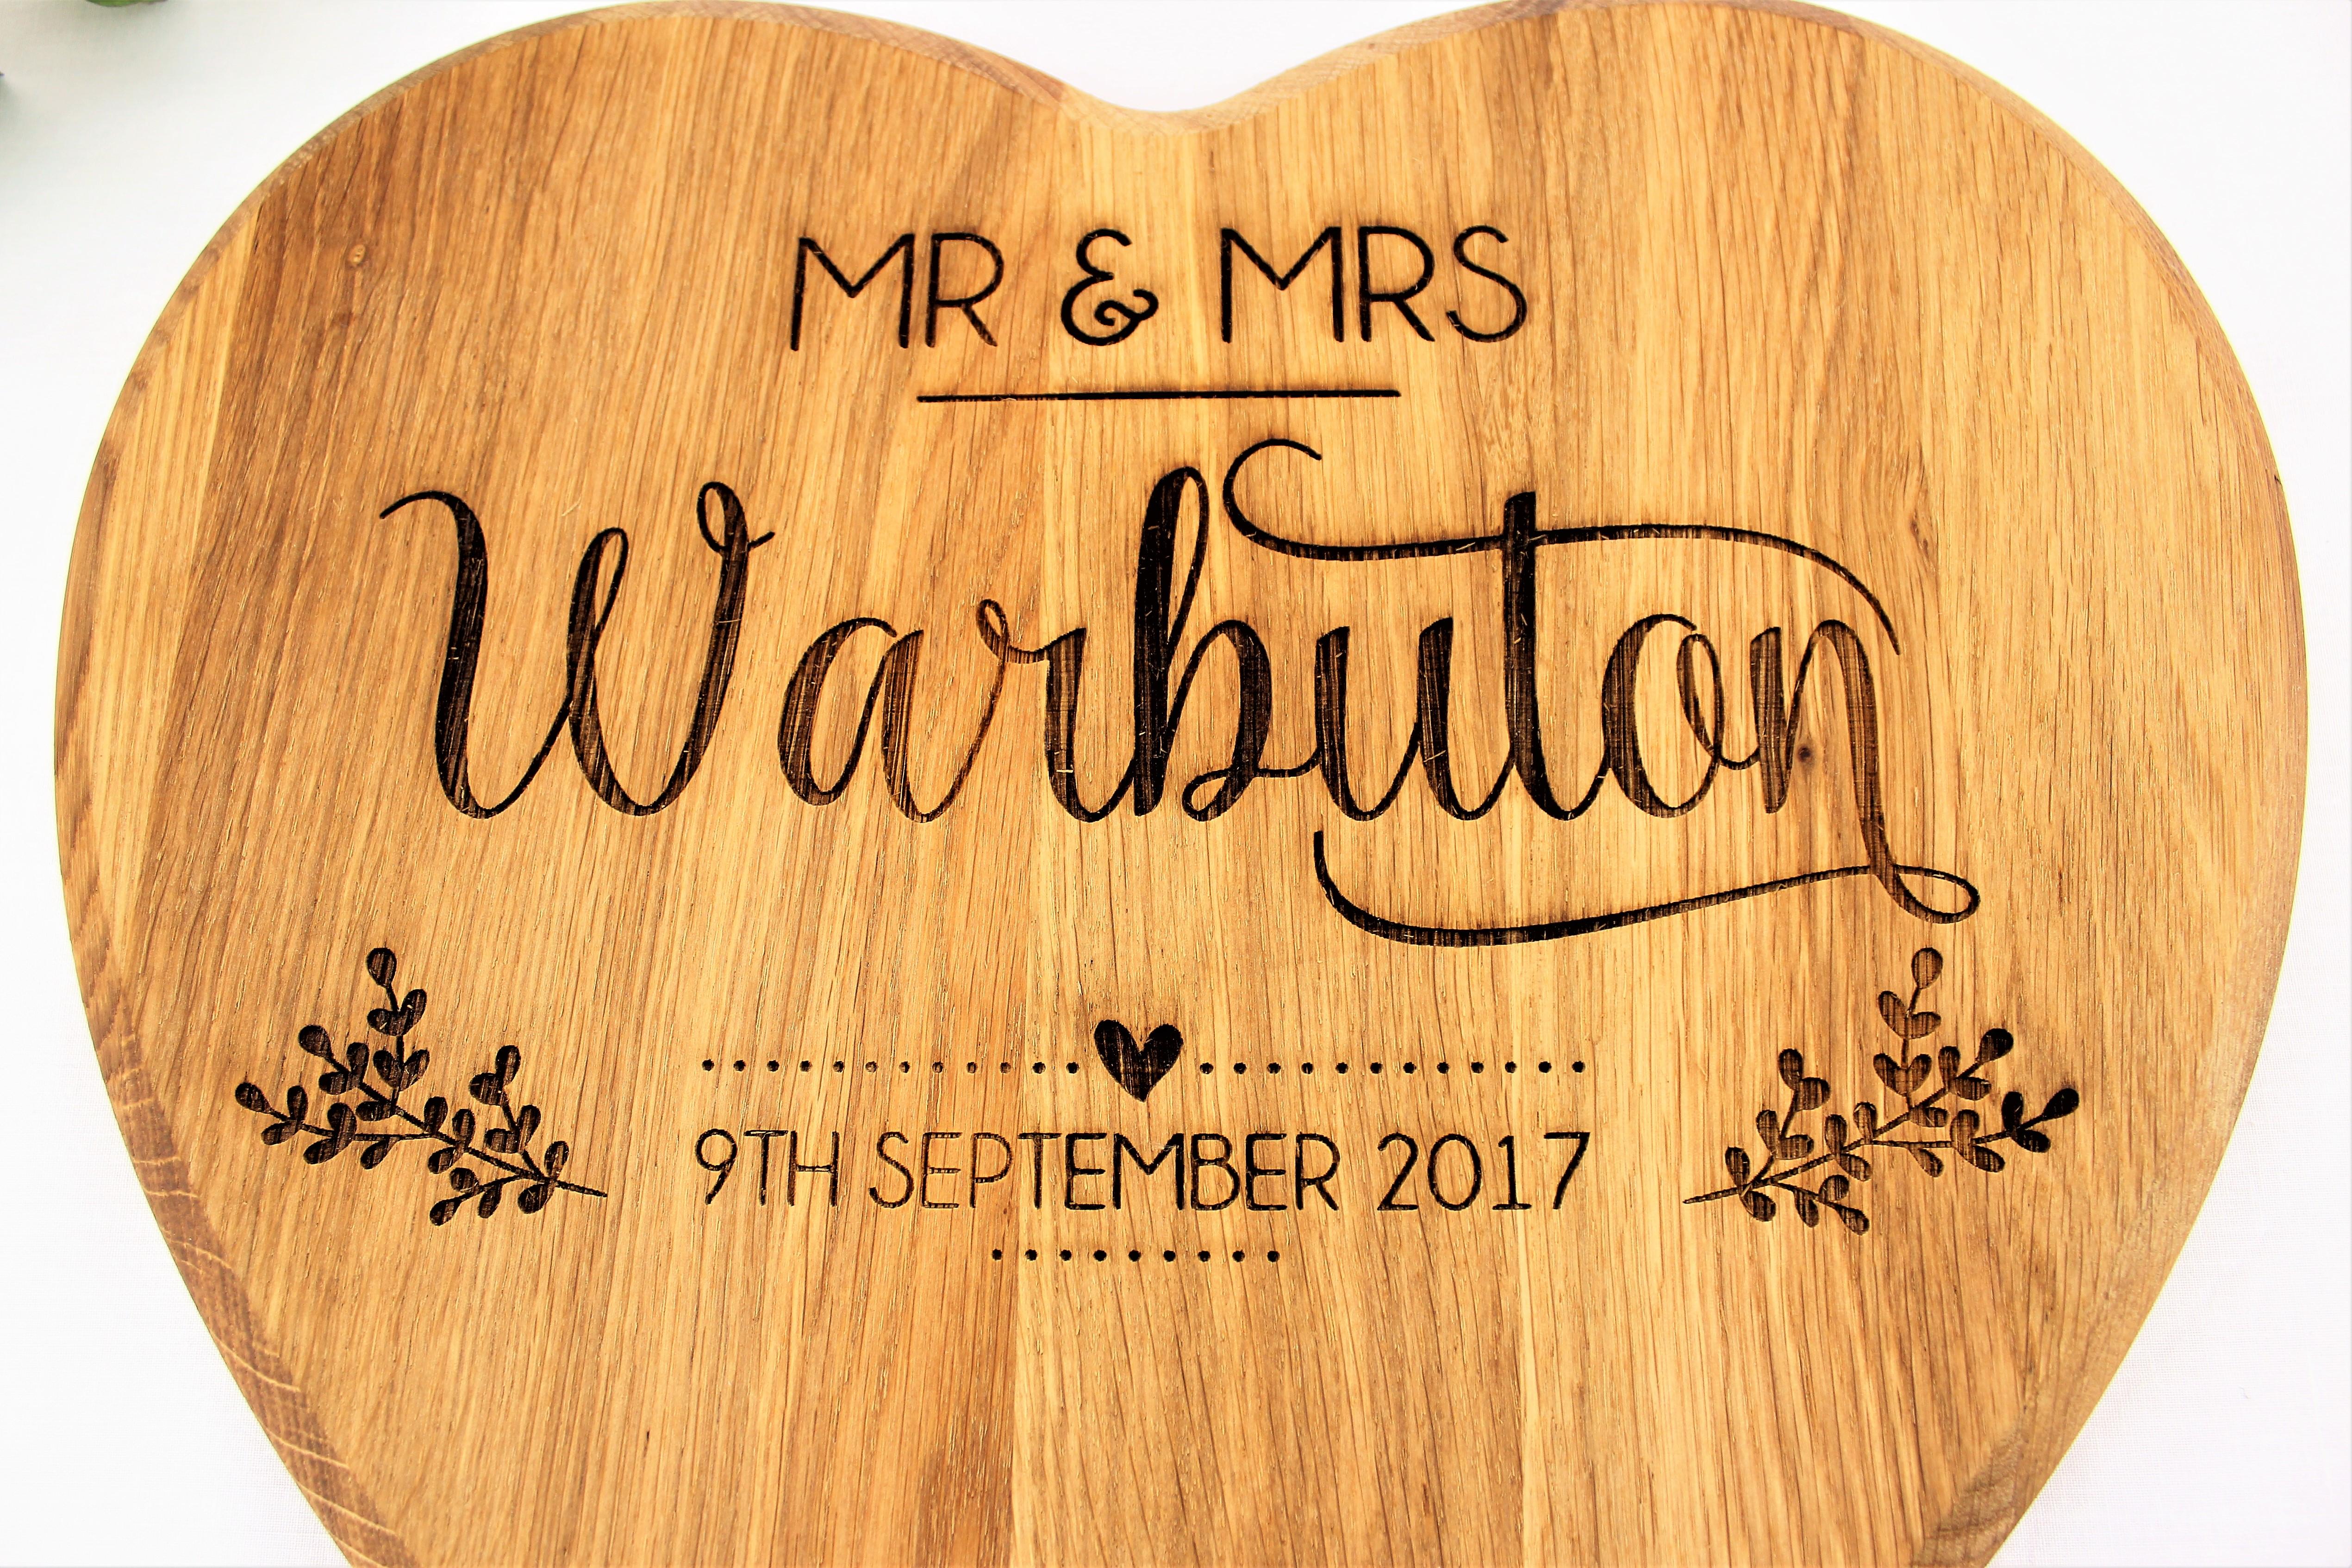 personalised solid oak heart shaped chopping board